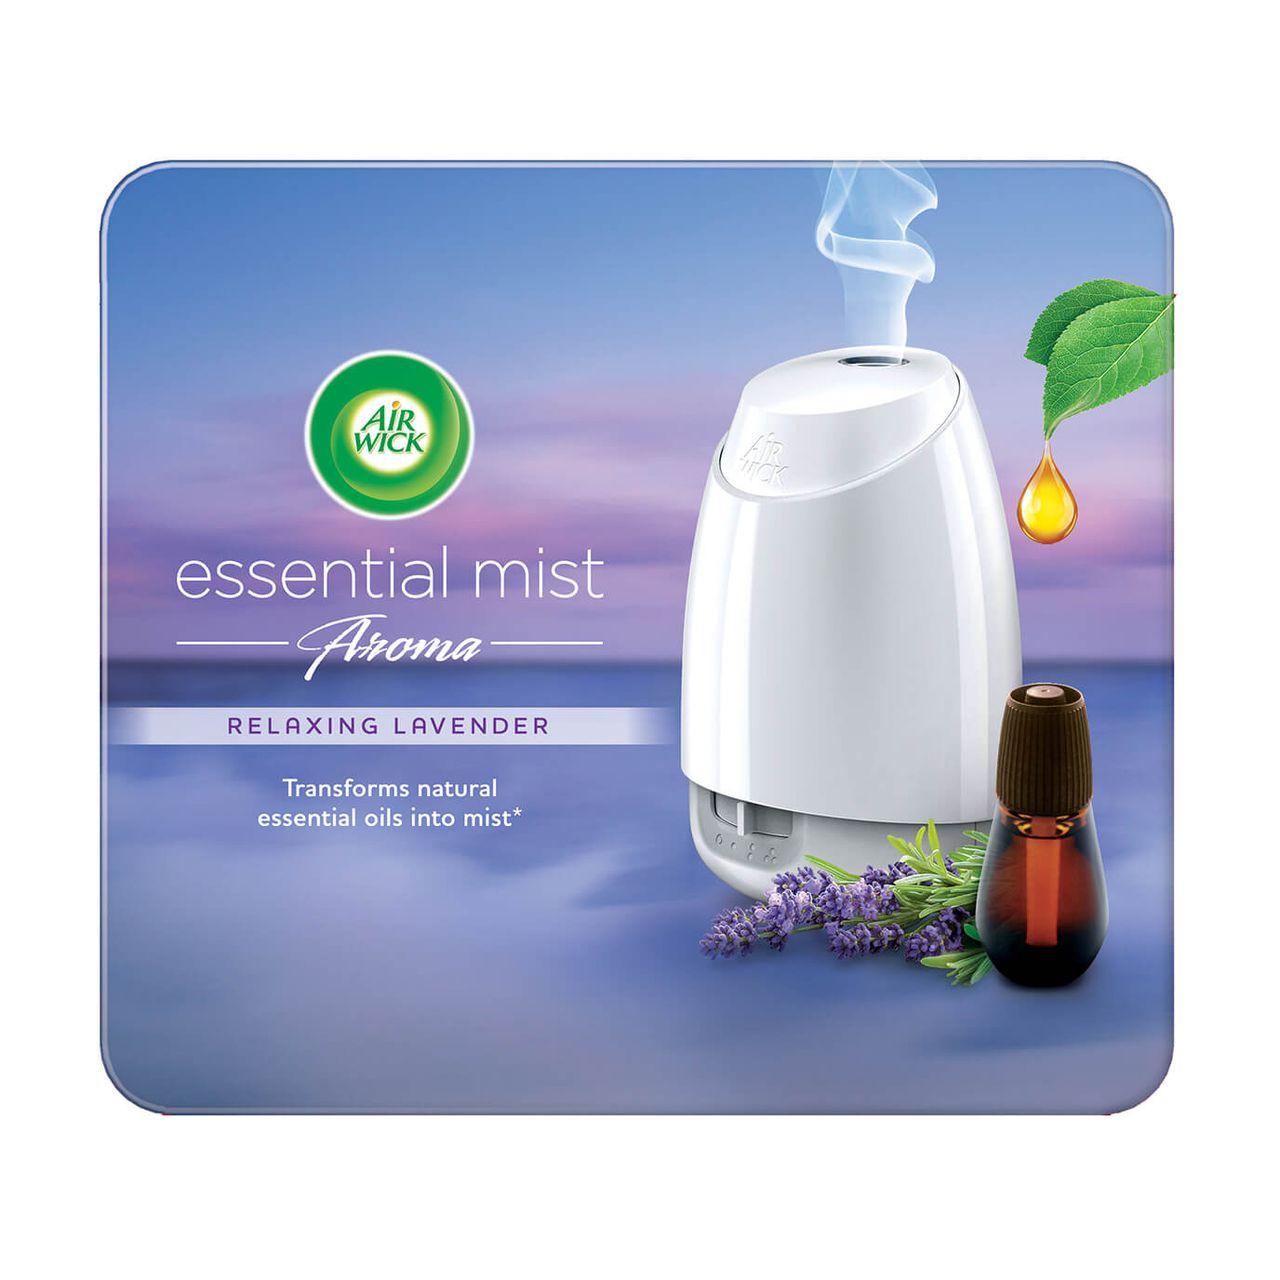 Air Wick Air Freshener Essential Mist Aromatherapy Lavender